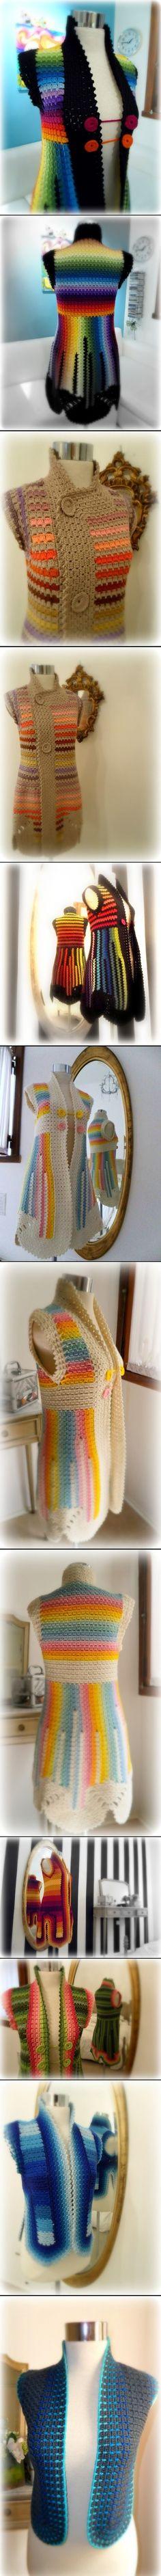 Crochet Jackets ♪ ♪ ... #inspiration_crochet #diy GB http://www.pinterest.com/gigibrazil/boards/